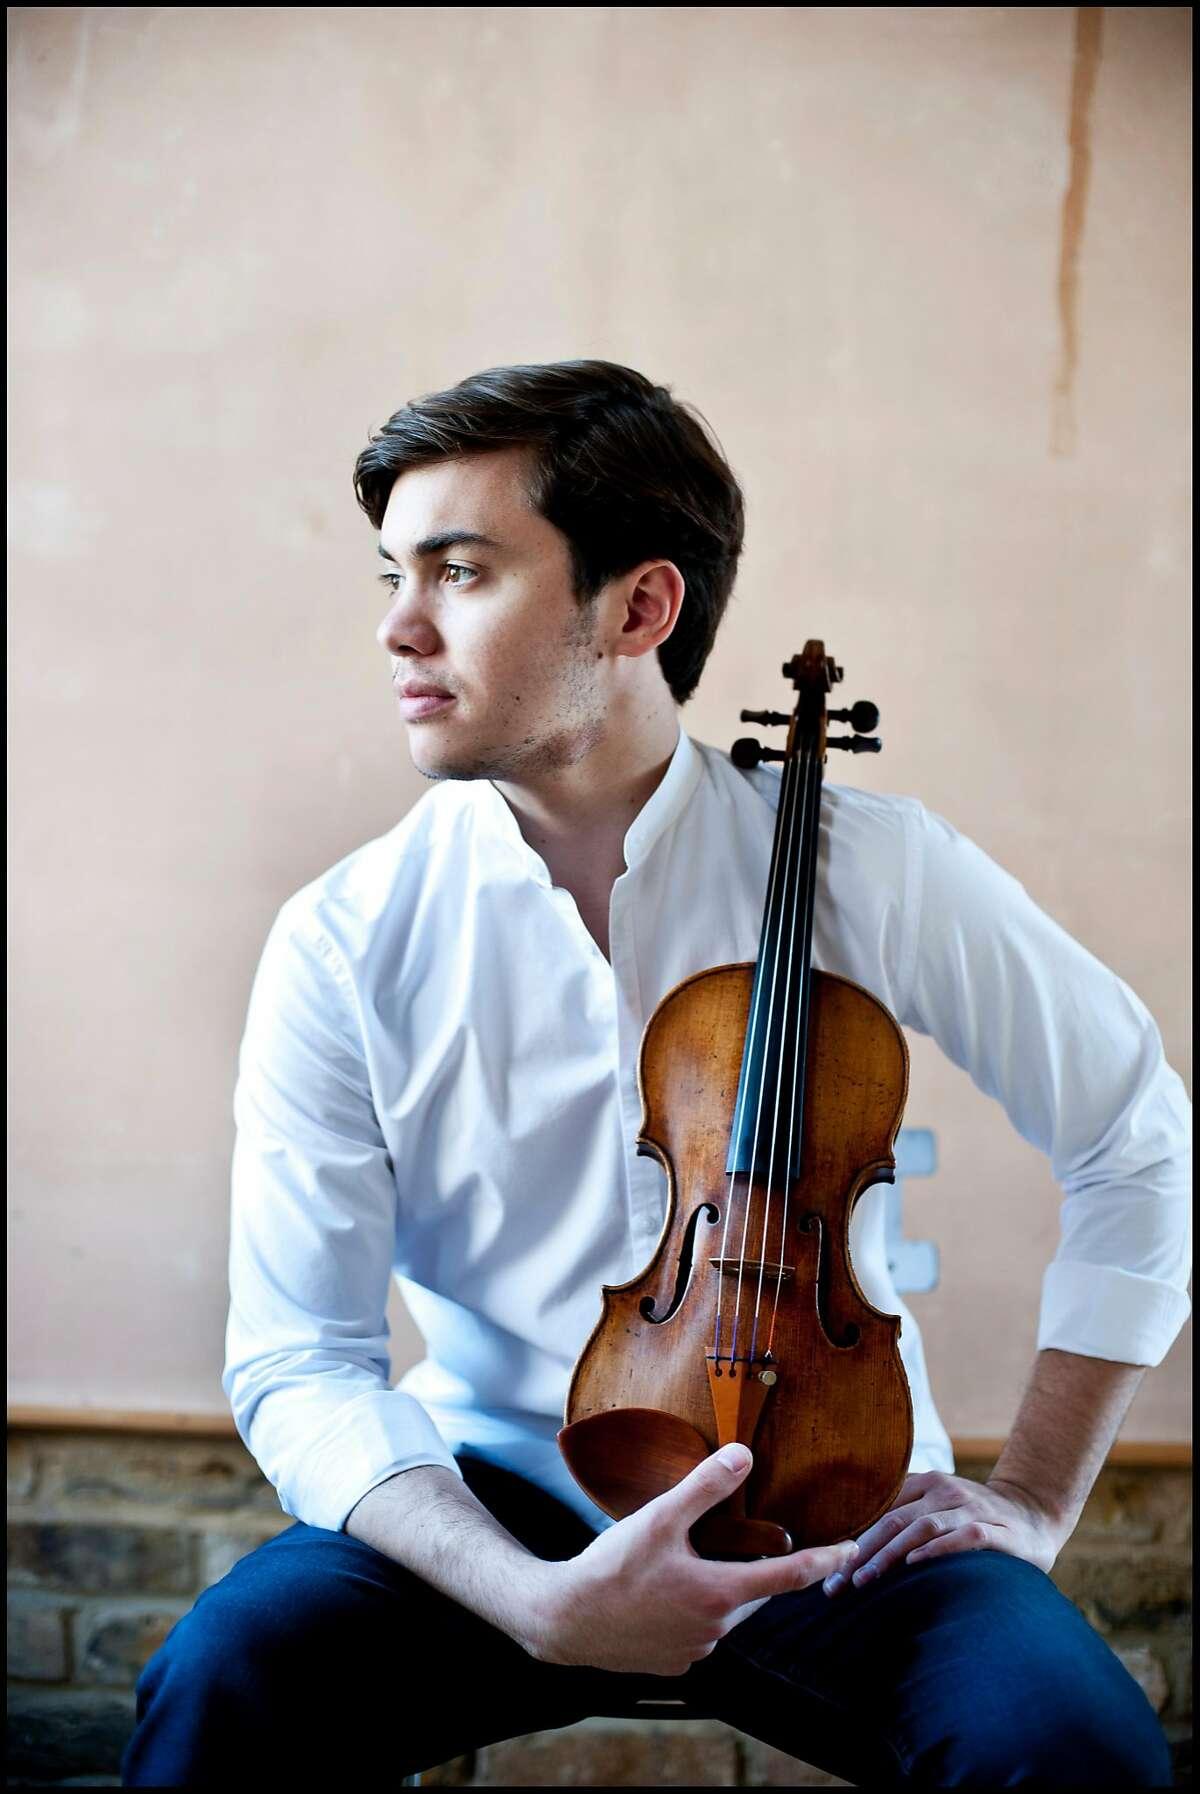 Violinist Benjamin Beilman